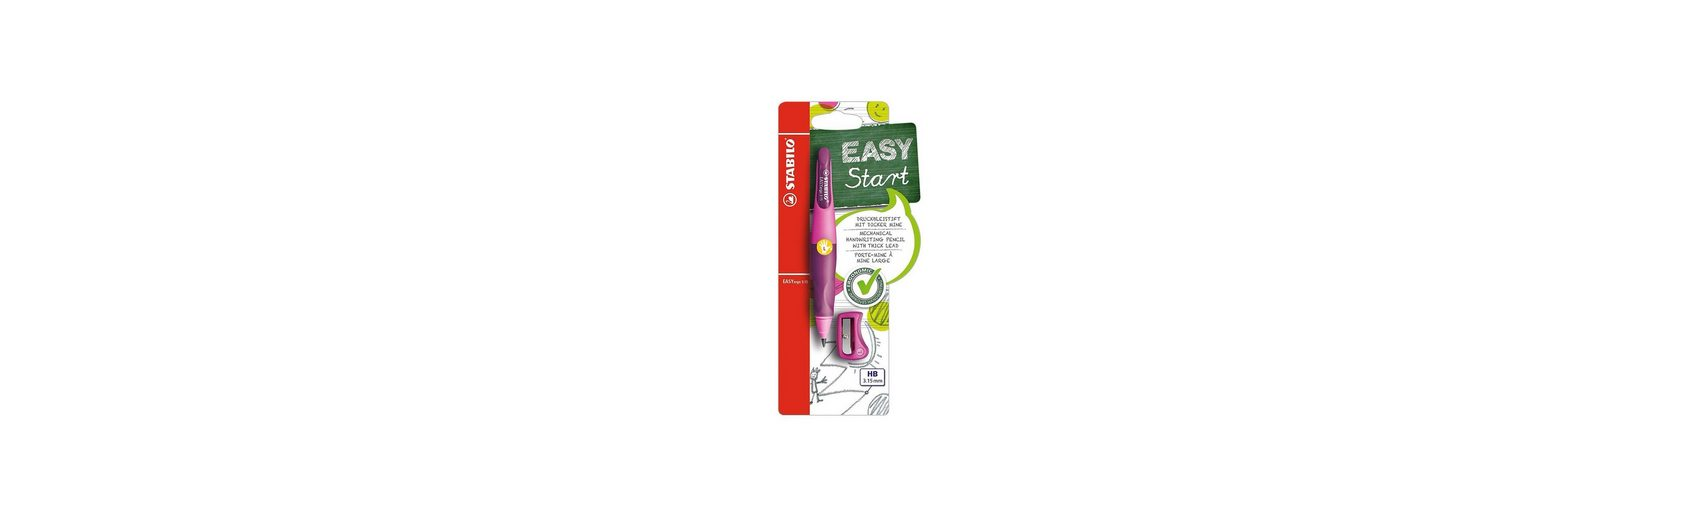 Stabilo Druckbleistift EASYergo 3.15 mm L pink/lila inkl. Spitzer